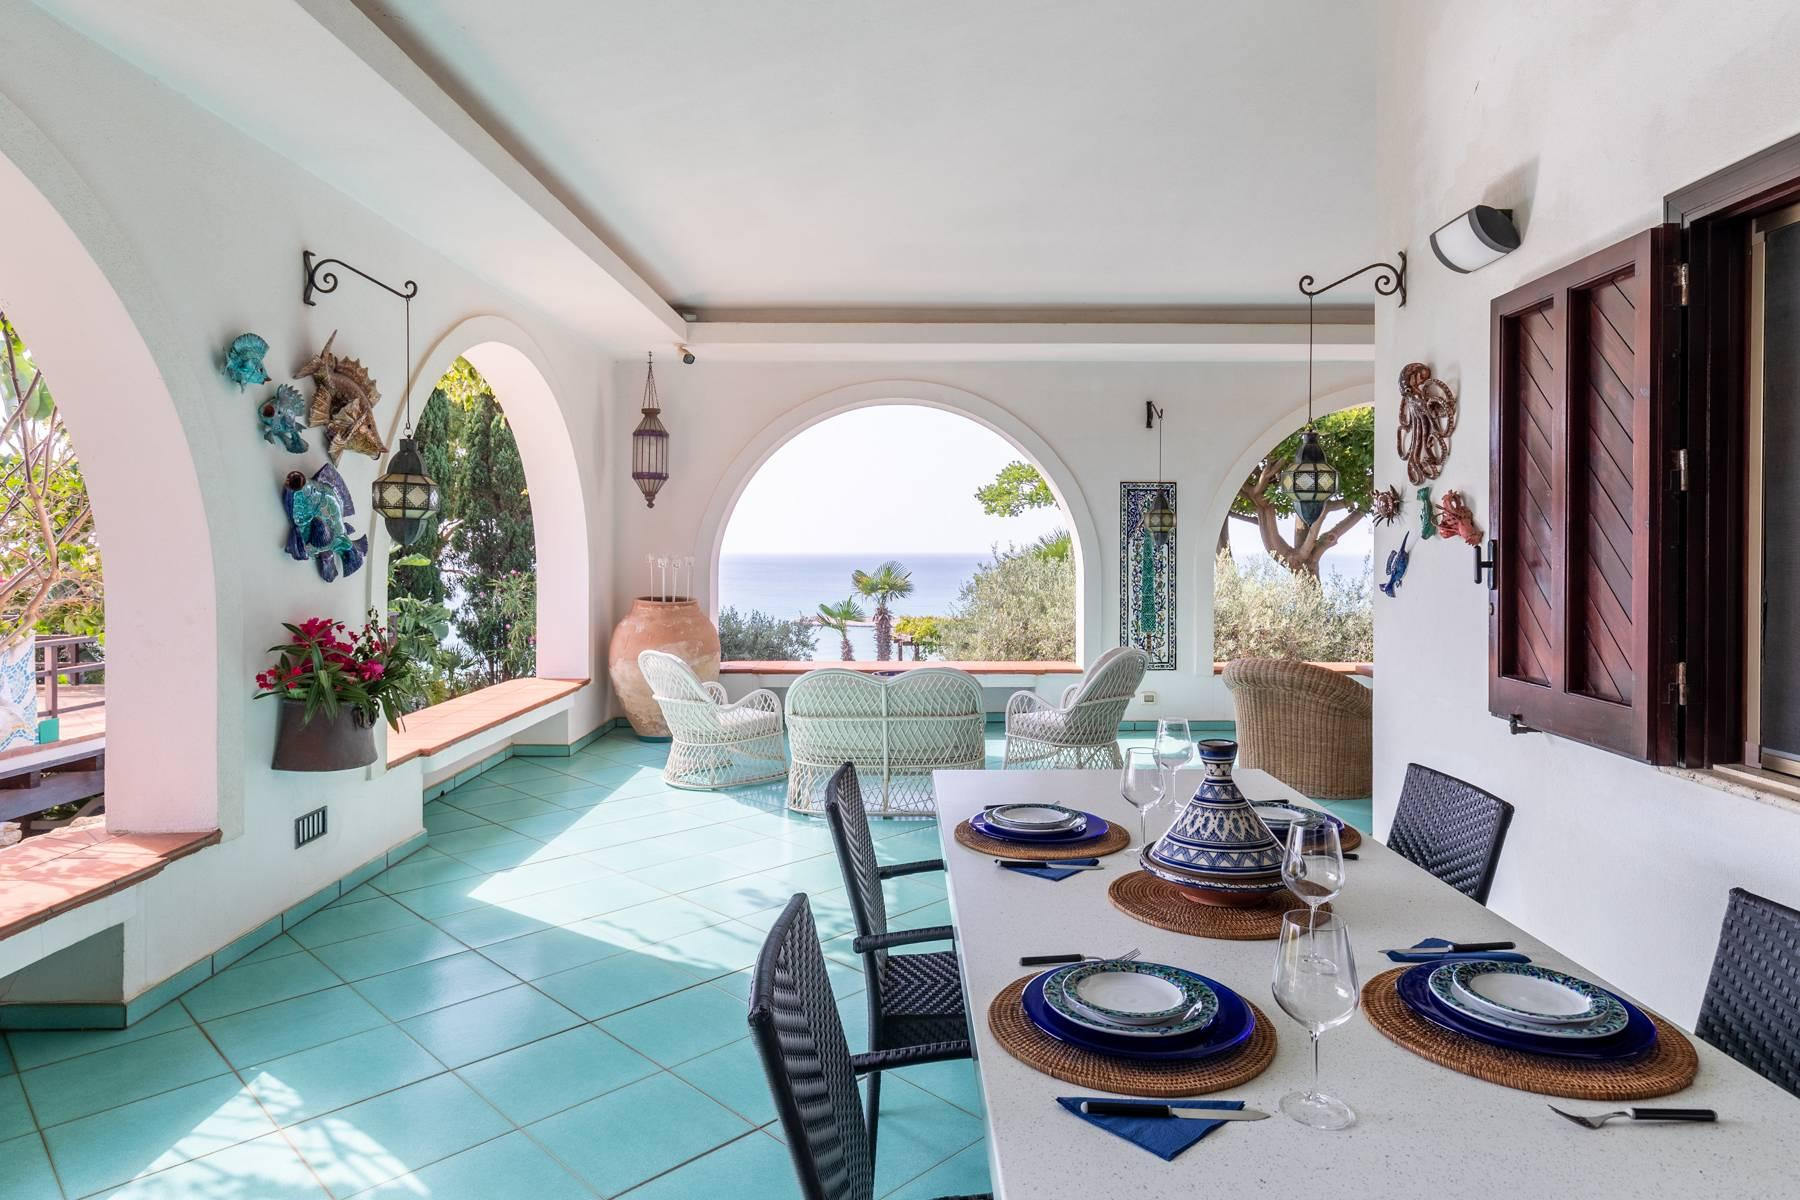 Sizilianische Villa am Mittel Meer - 4